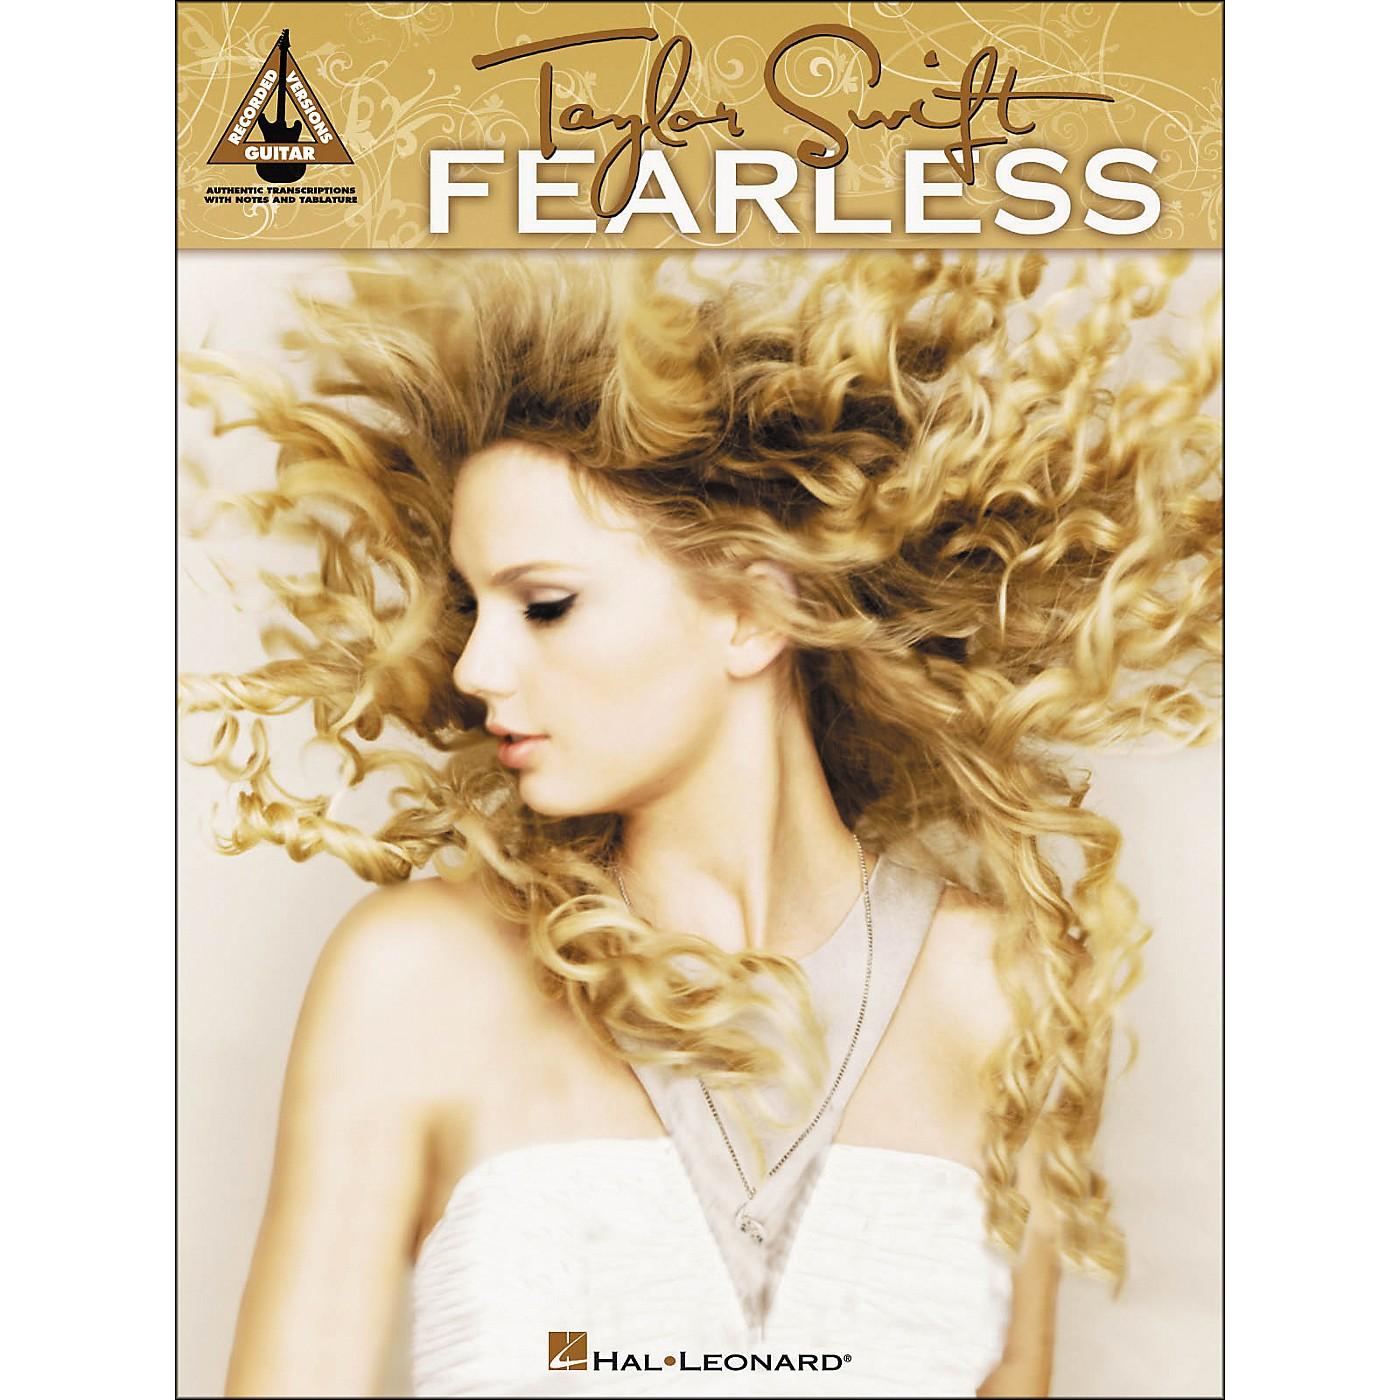 Hal Leonard Taylor Swift - Fearless Tab Book thumbnail